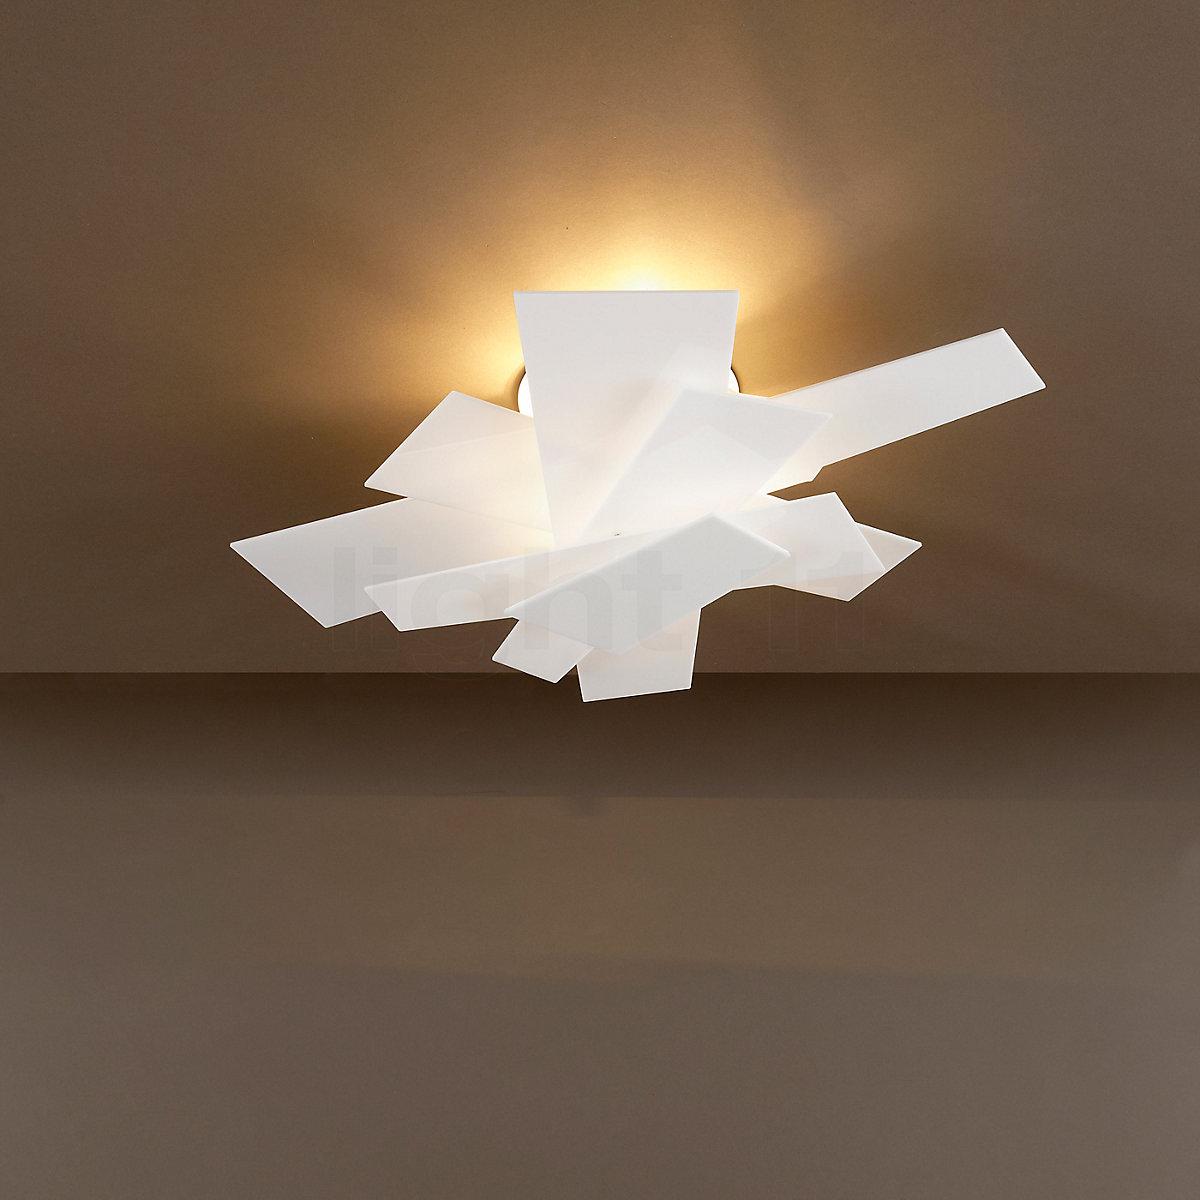 Buy Foscarini Big Bang Parete Soffitto At Light11 Eu